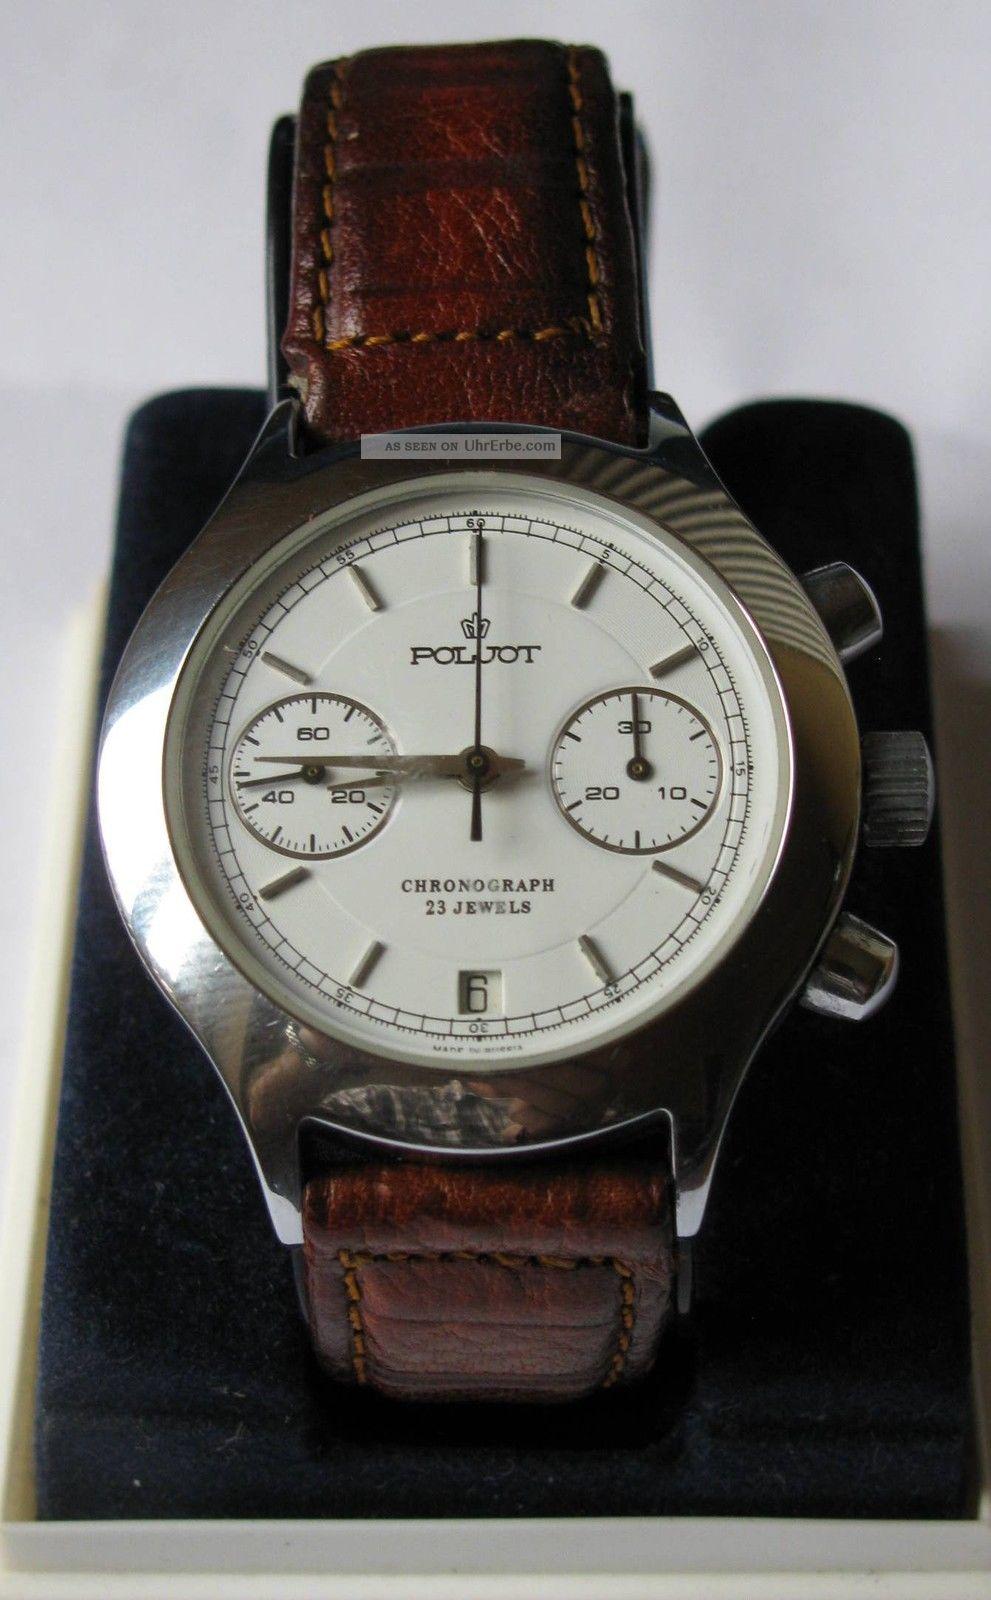 Poljot Chronograph,  Kaufdatum März 2000,  Mit Originalpapieren Aus Donetsk Armbanduhren Bild